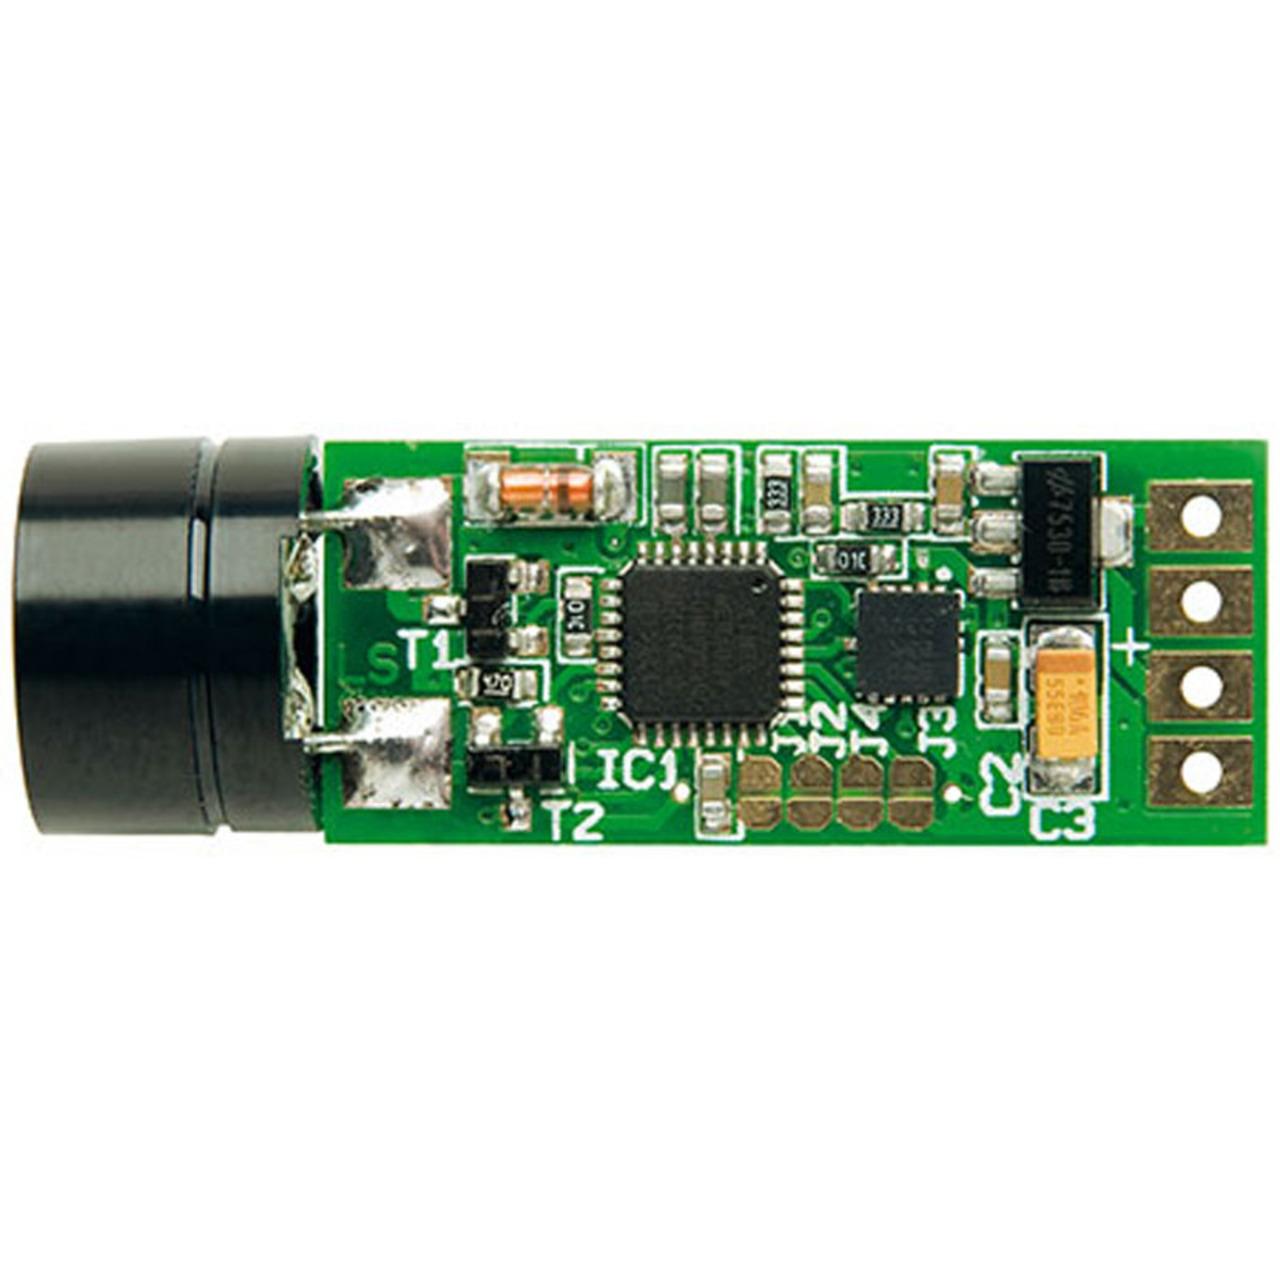 ELV Ortungspieper fund-252 r Modellbau OPM1